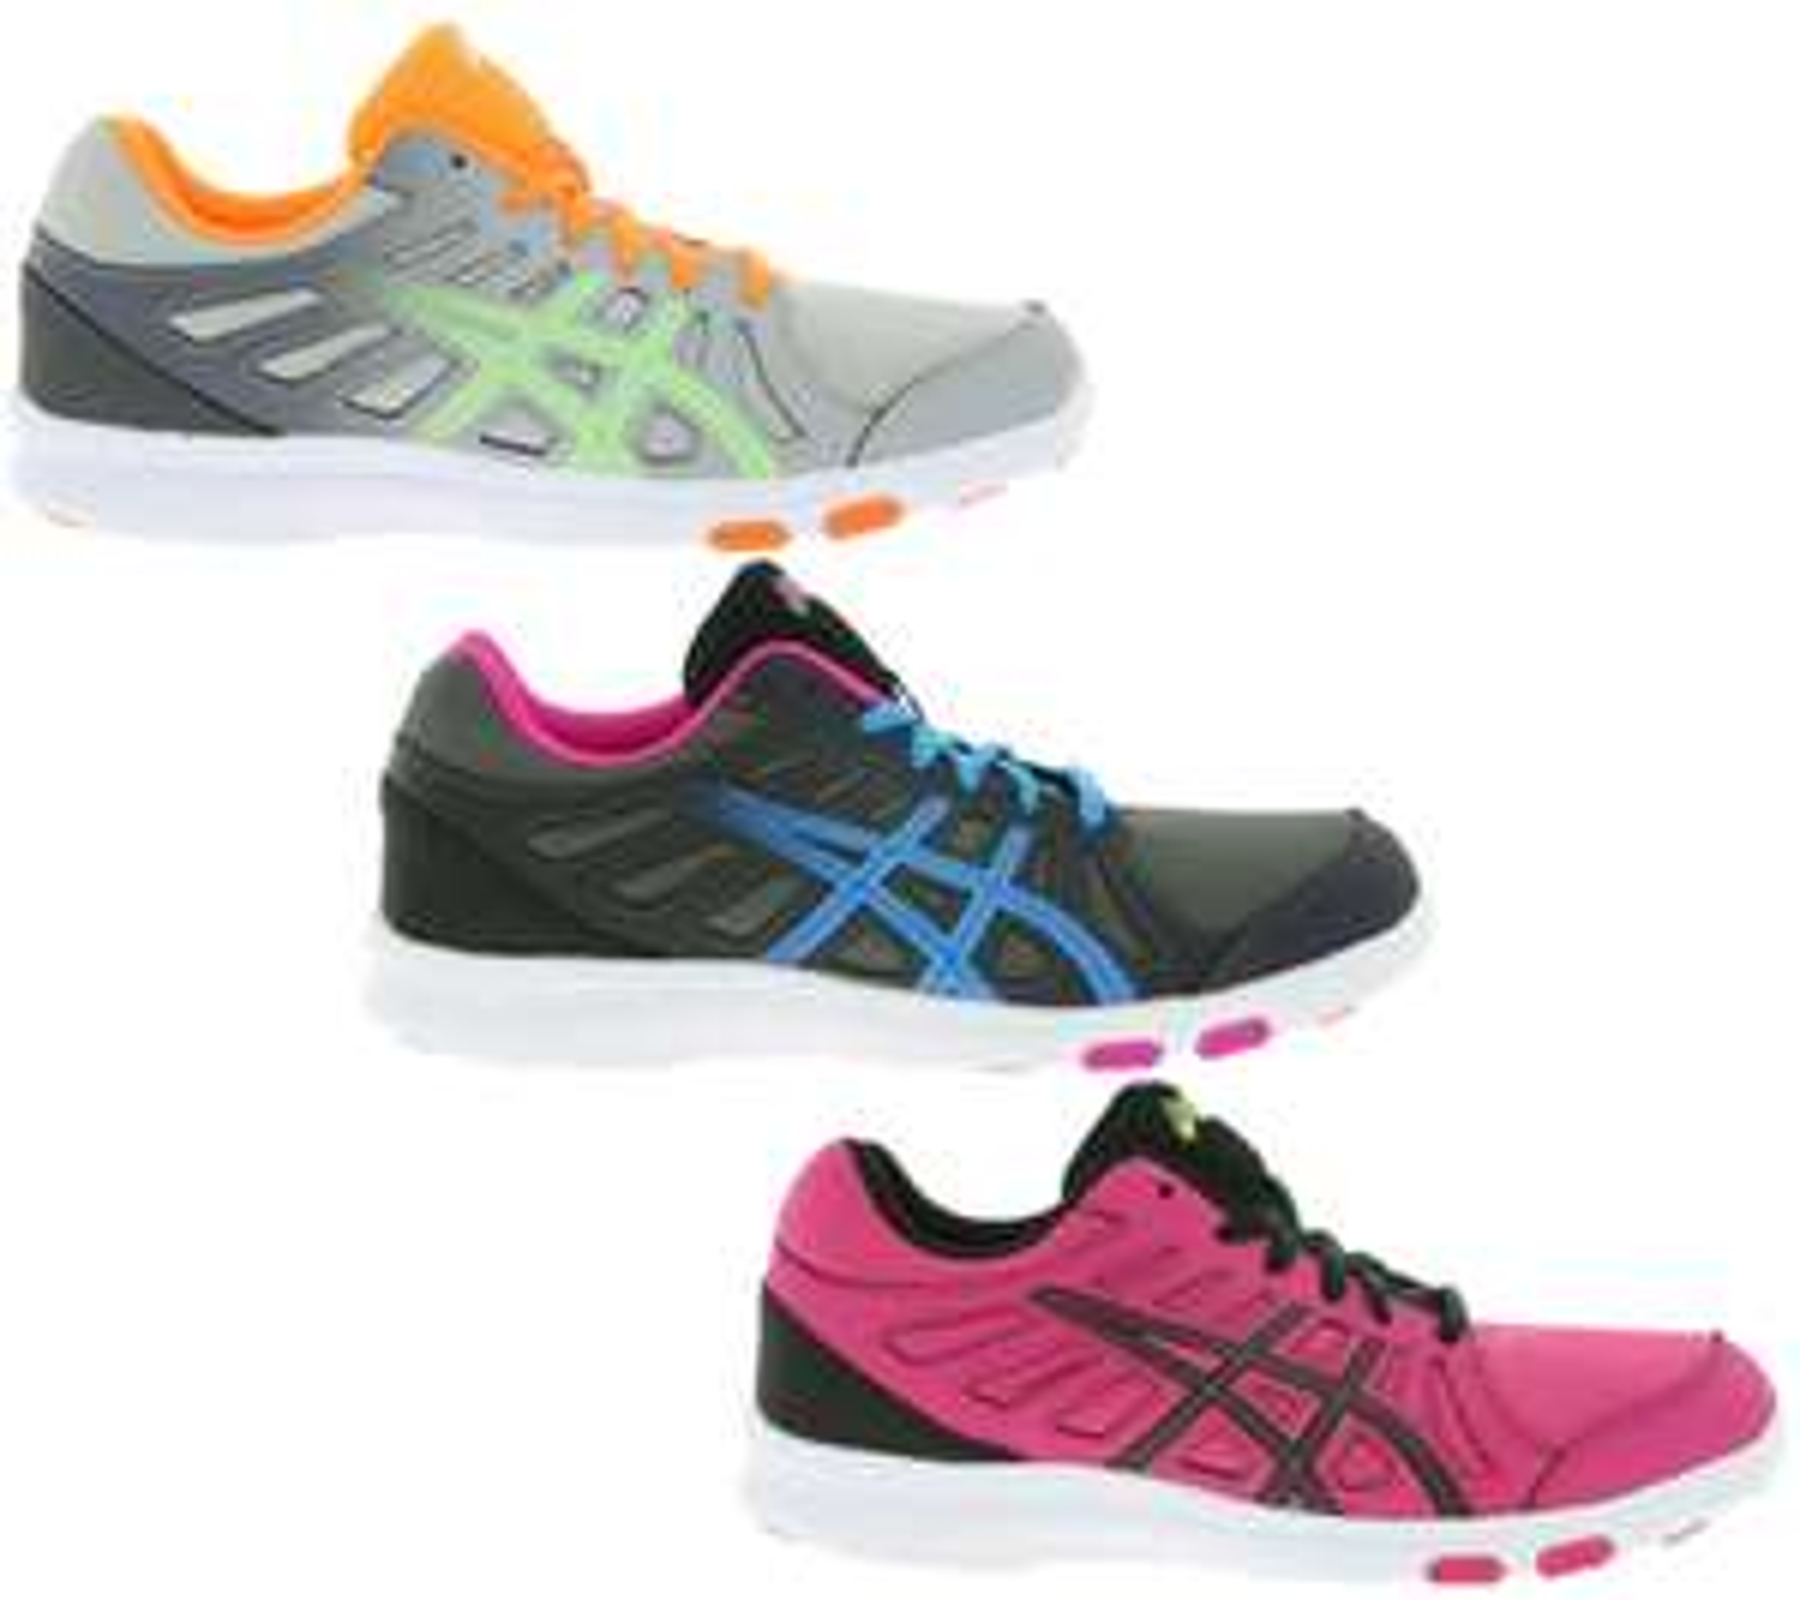 Chaussures femme asics Ayami-Shine - Taille 39.5 - 42